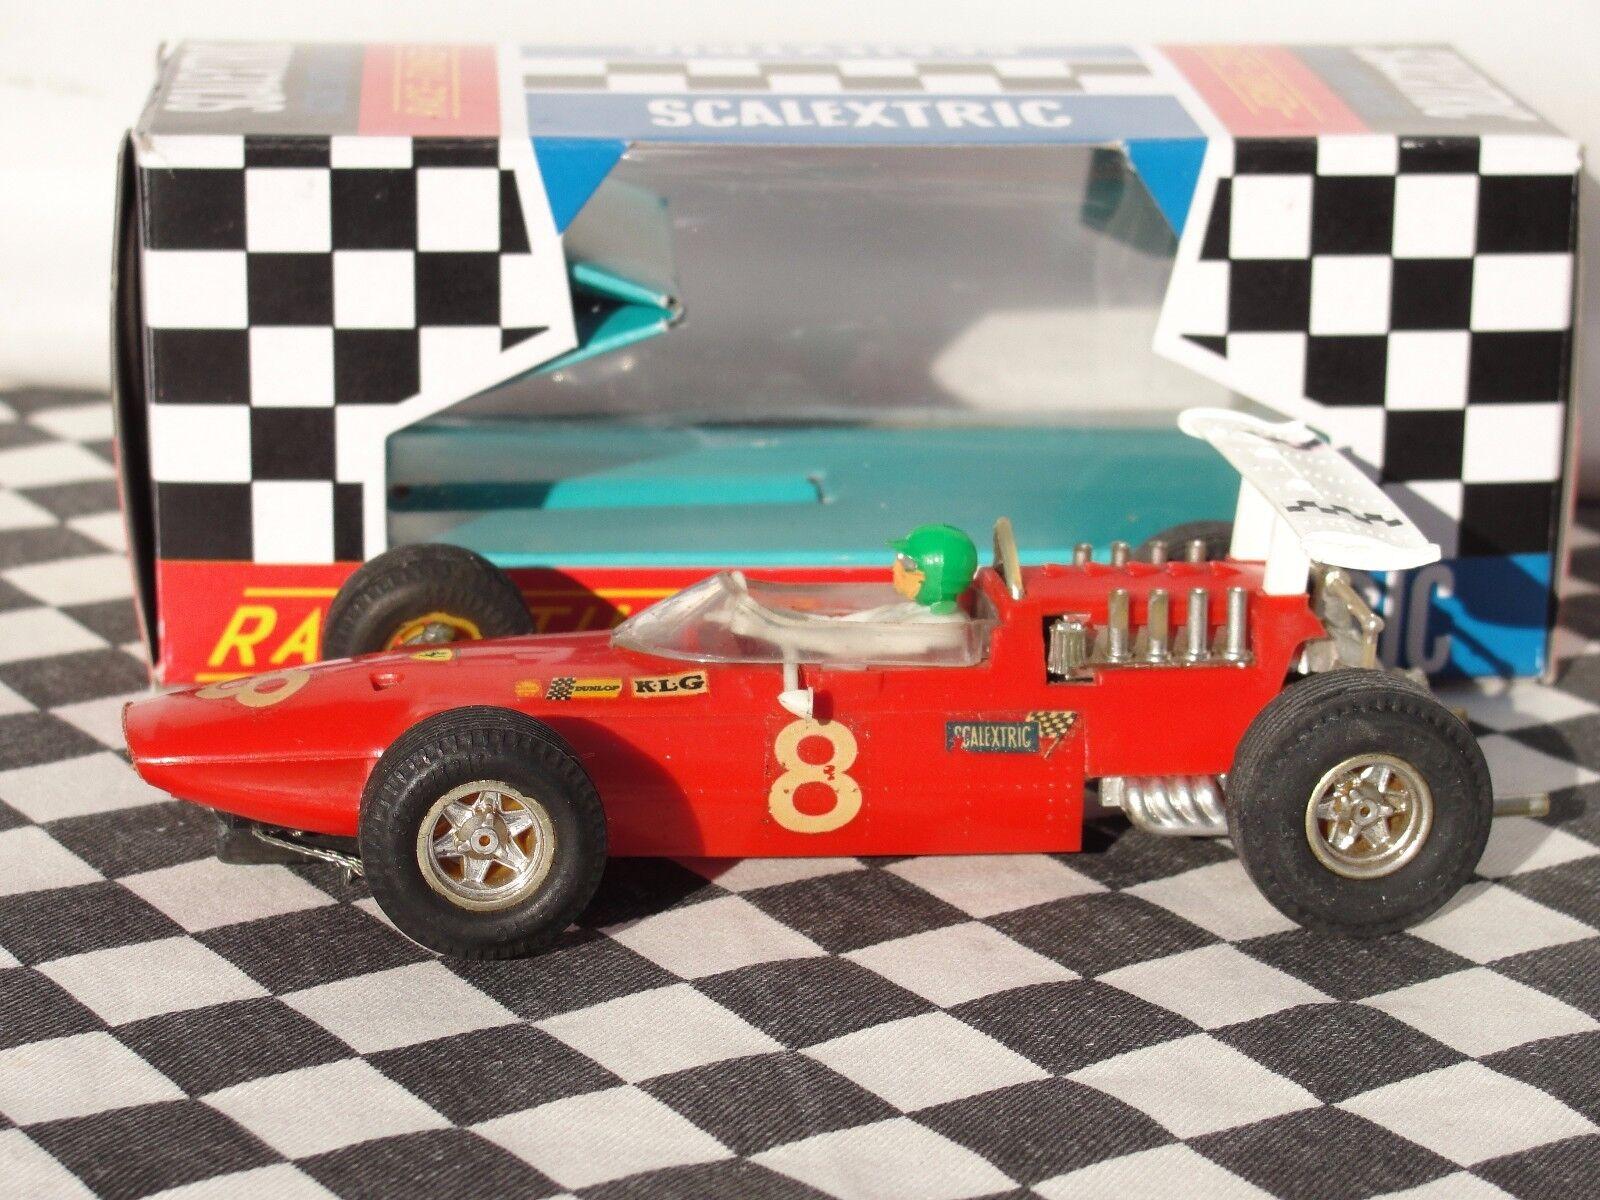 SCALEXTRIC 1960 s FERRARI 158 V8 röd C9 1.32 ANVÄNT BOXED